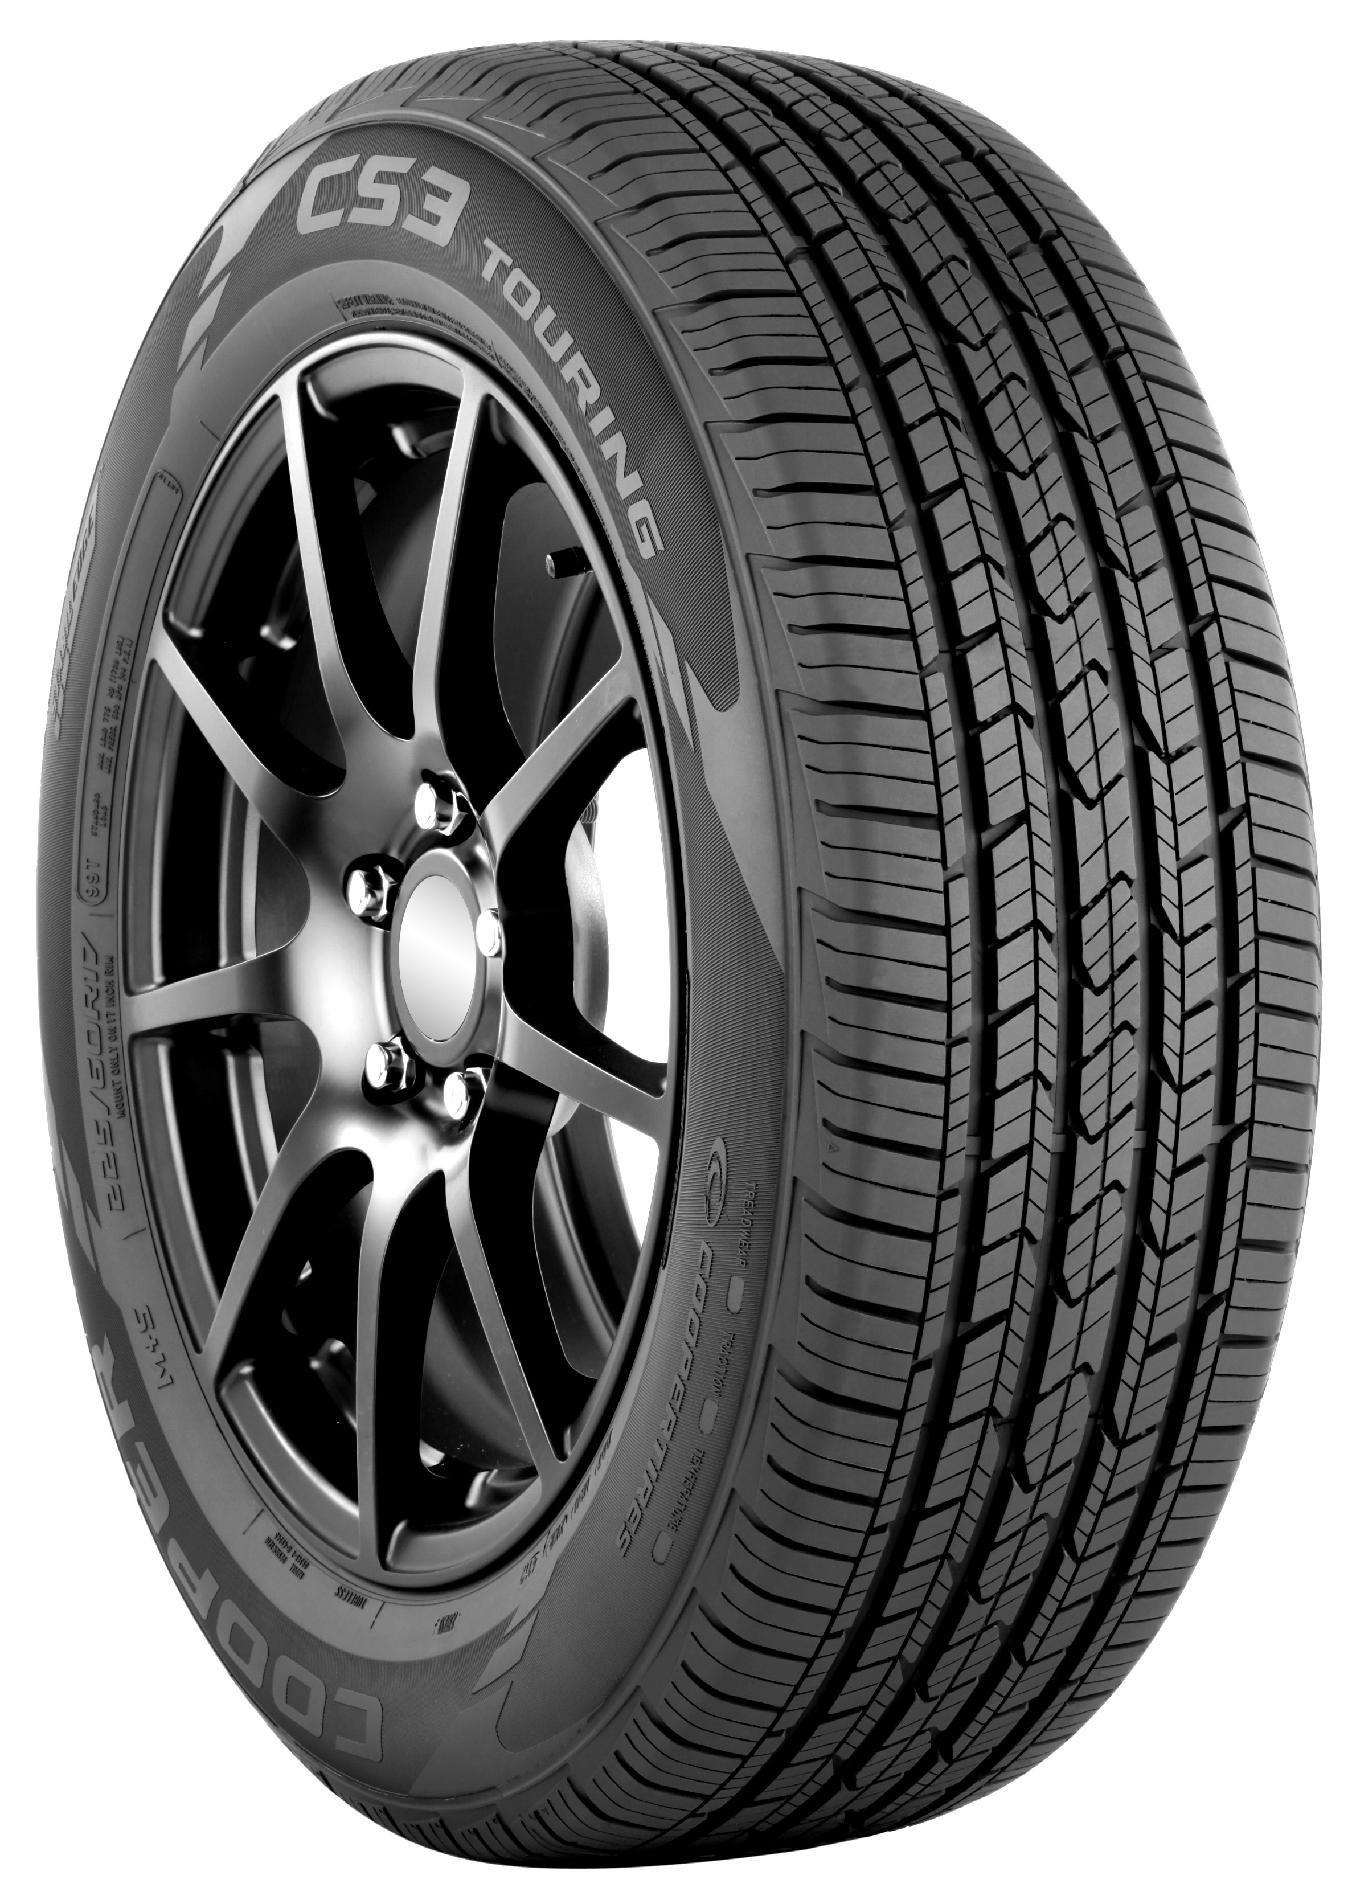 Cooper CS3 TOURING - 185/65R14 86H - All Season Tire